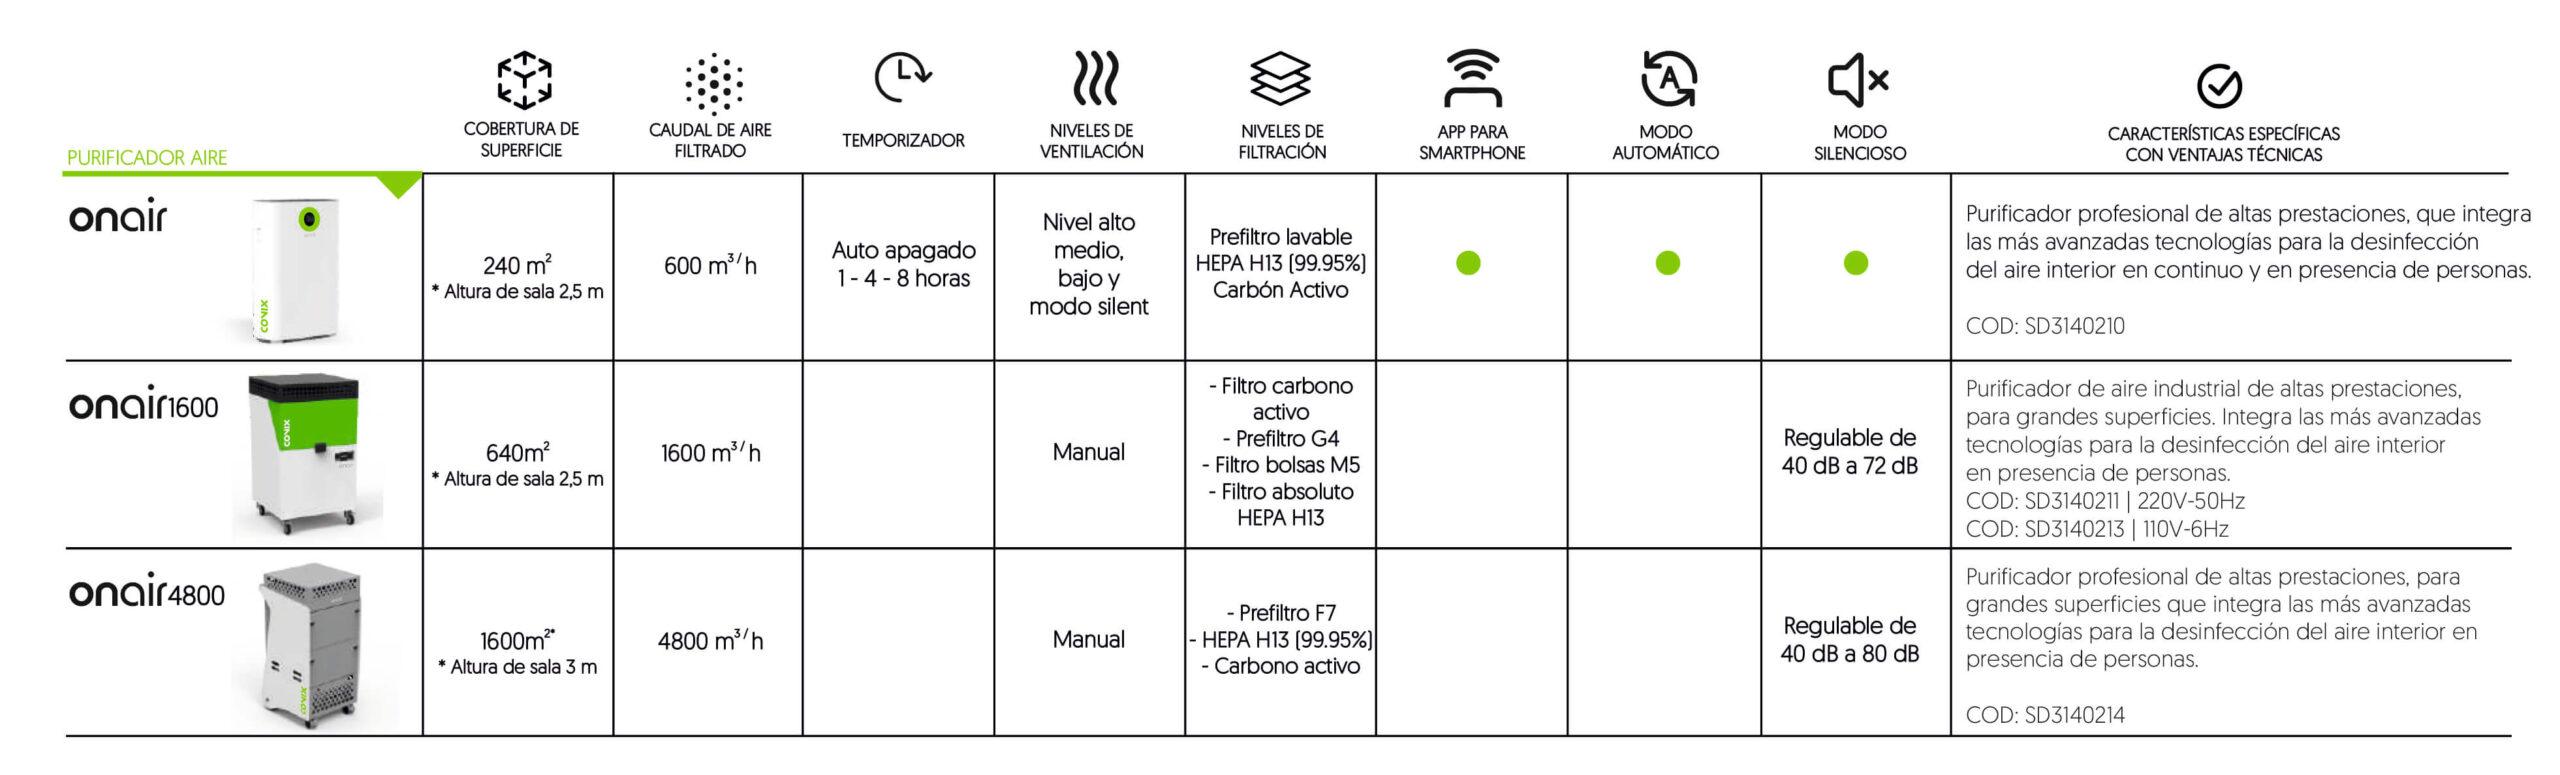 COMPARATIVA DE PURIFICADORES DE AIRE ONAIR